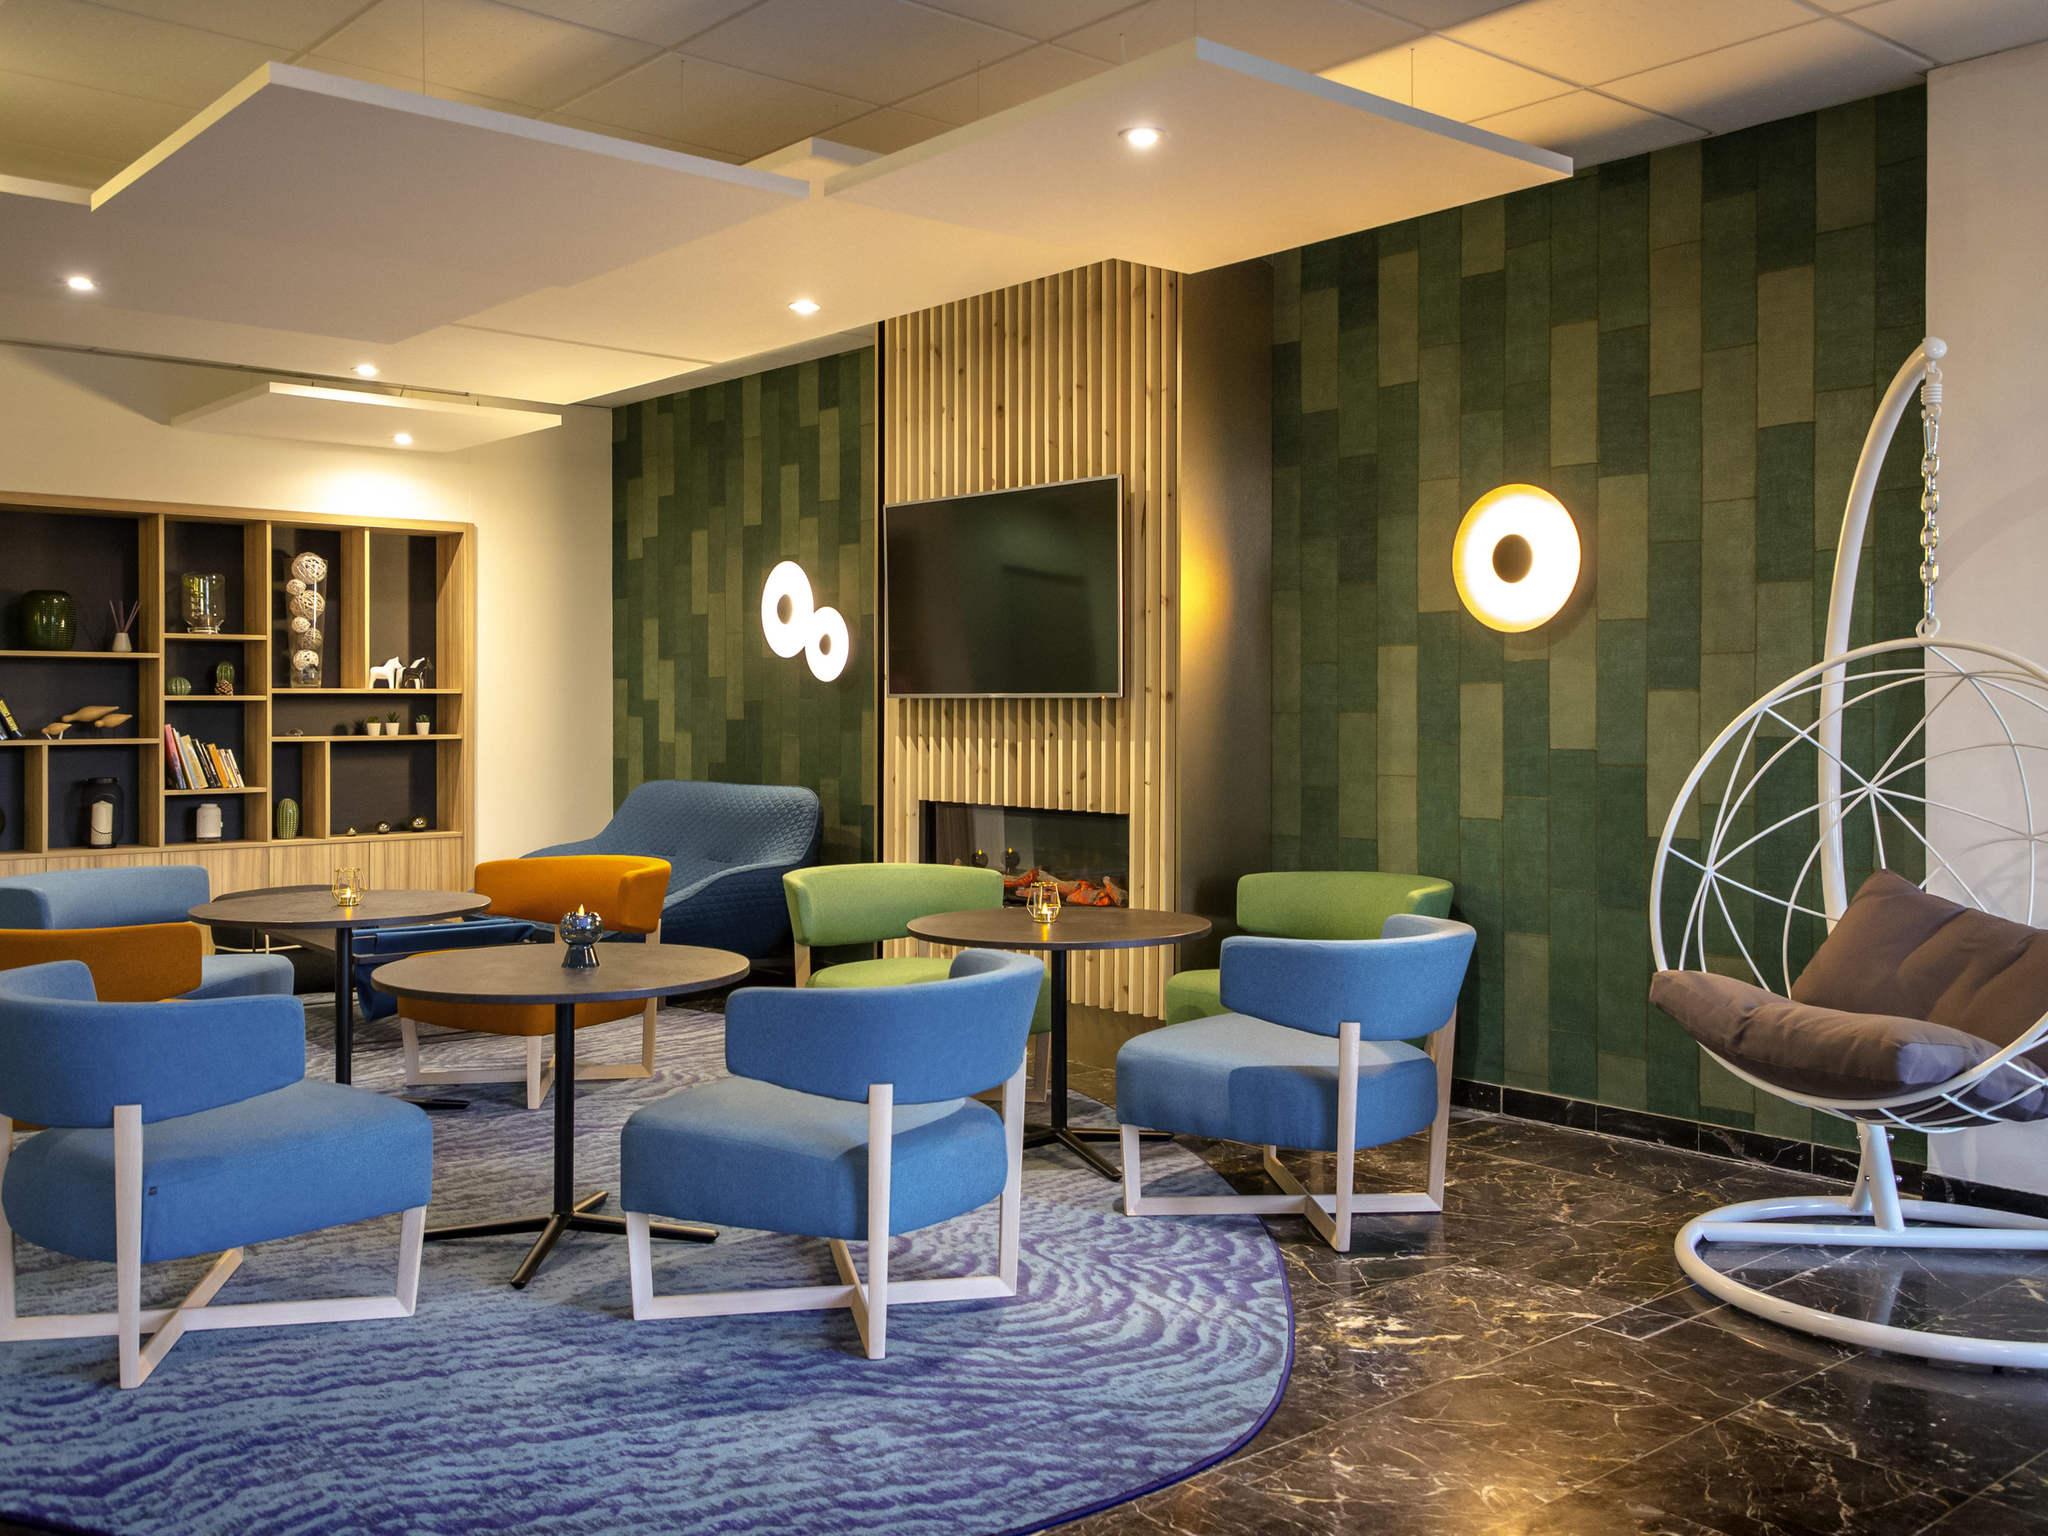 hotel mercure cavaillon france. Black Bedroom Furniture Sets. Home Design Ideas